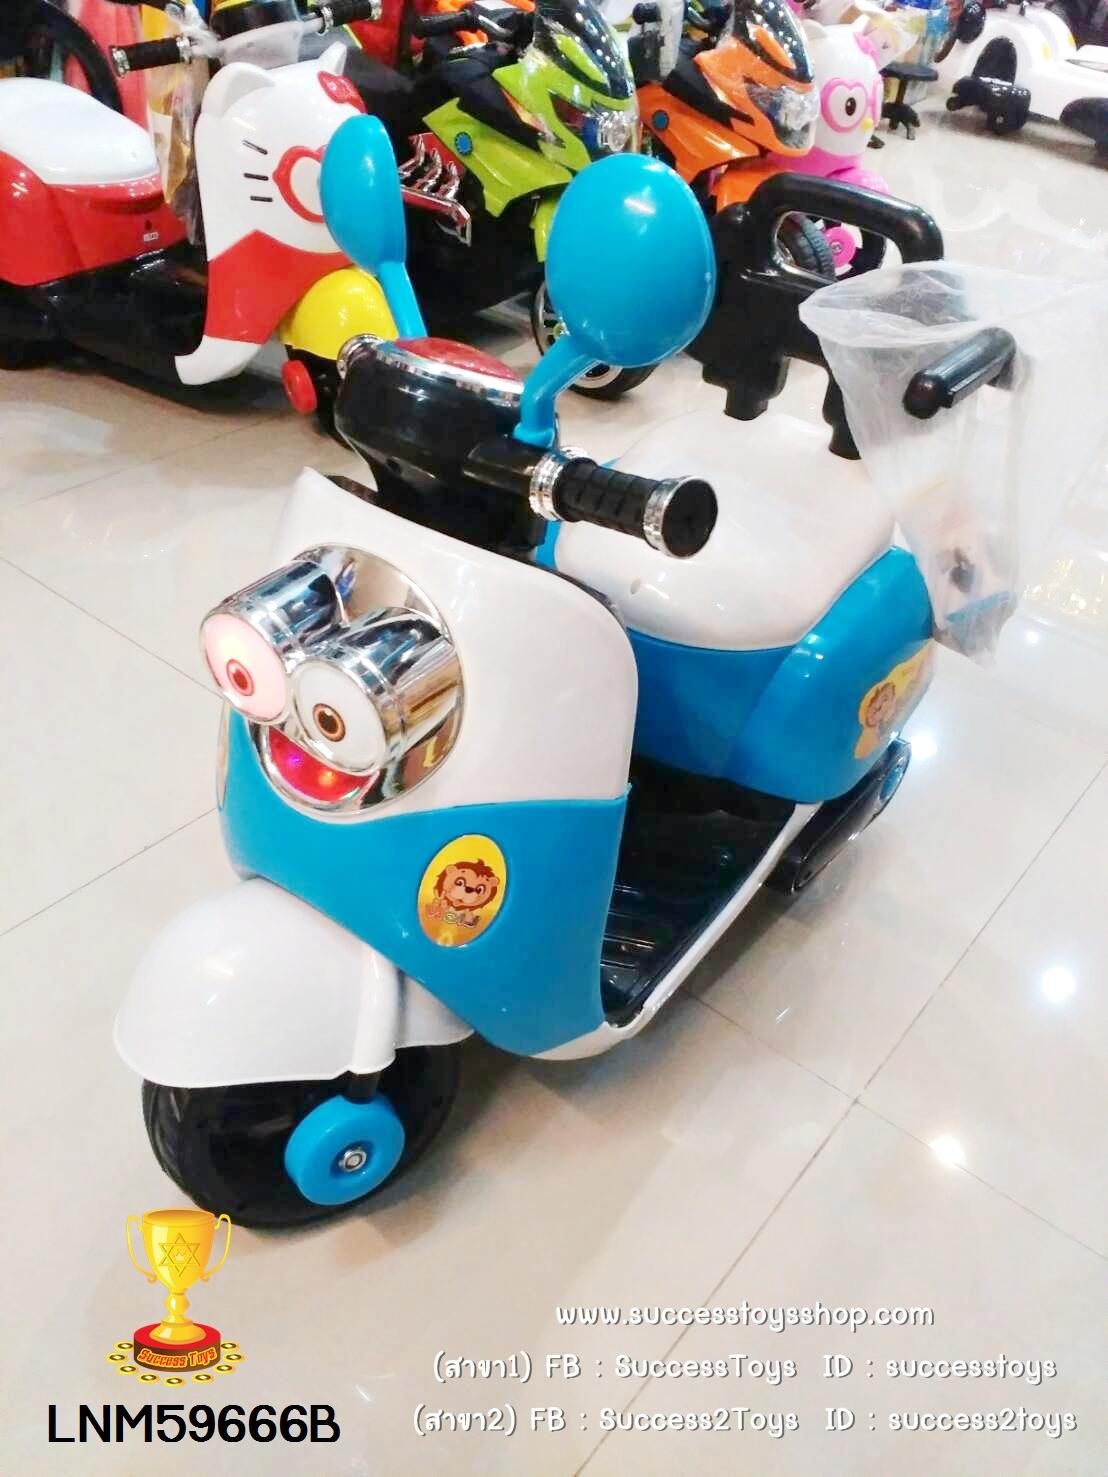 LNM59666B รถมอเตอร์ไซค์มินเนี่ยนสีฟ้า (MP3)